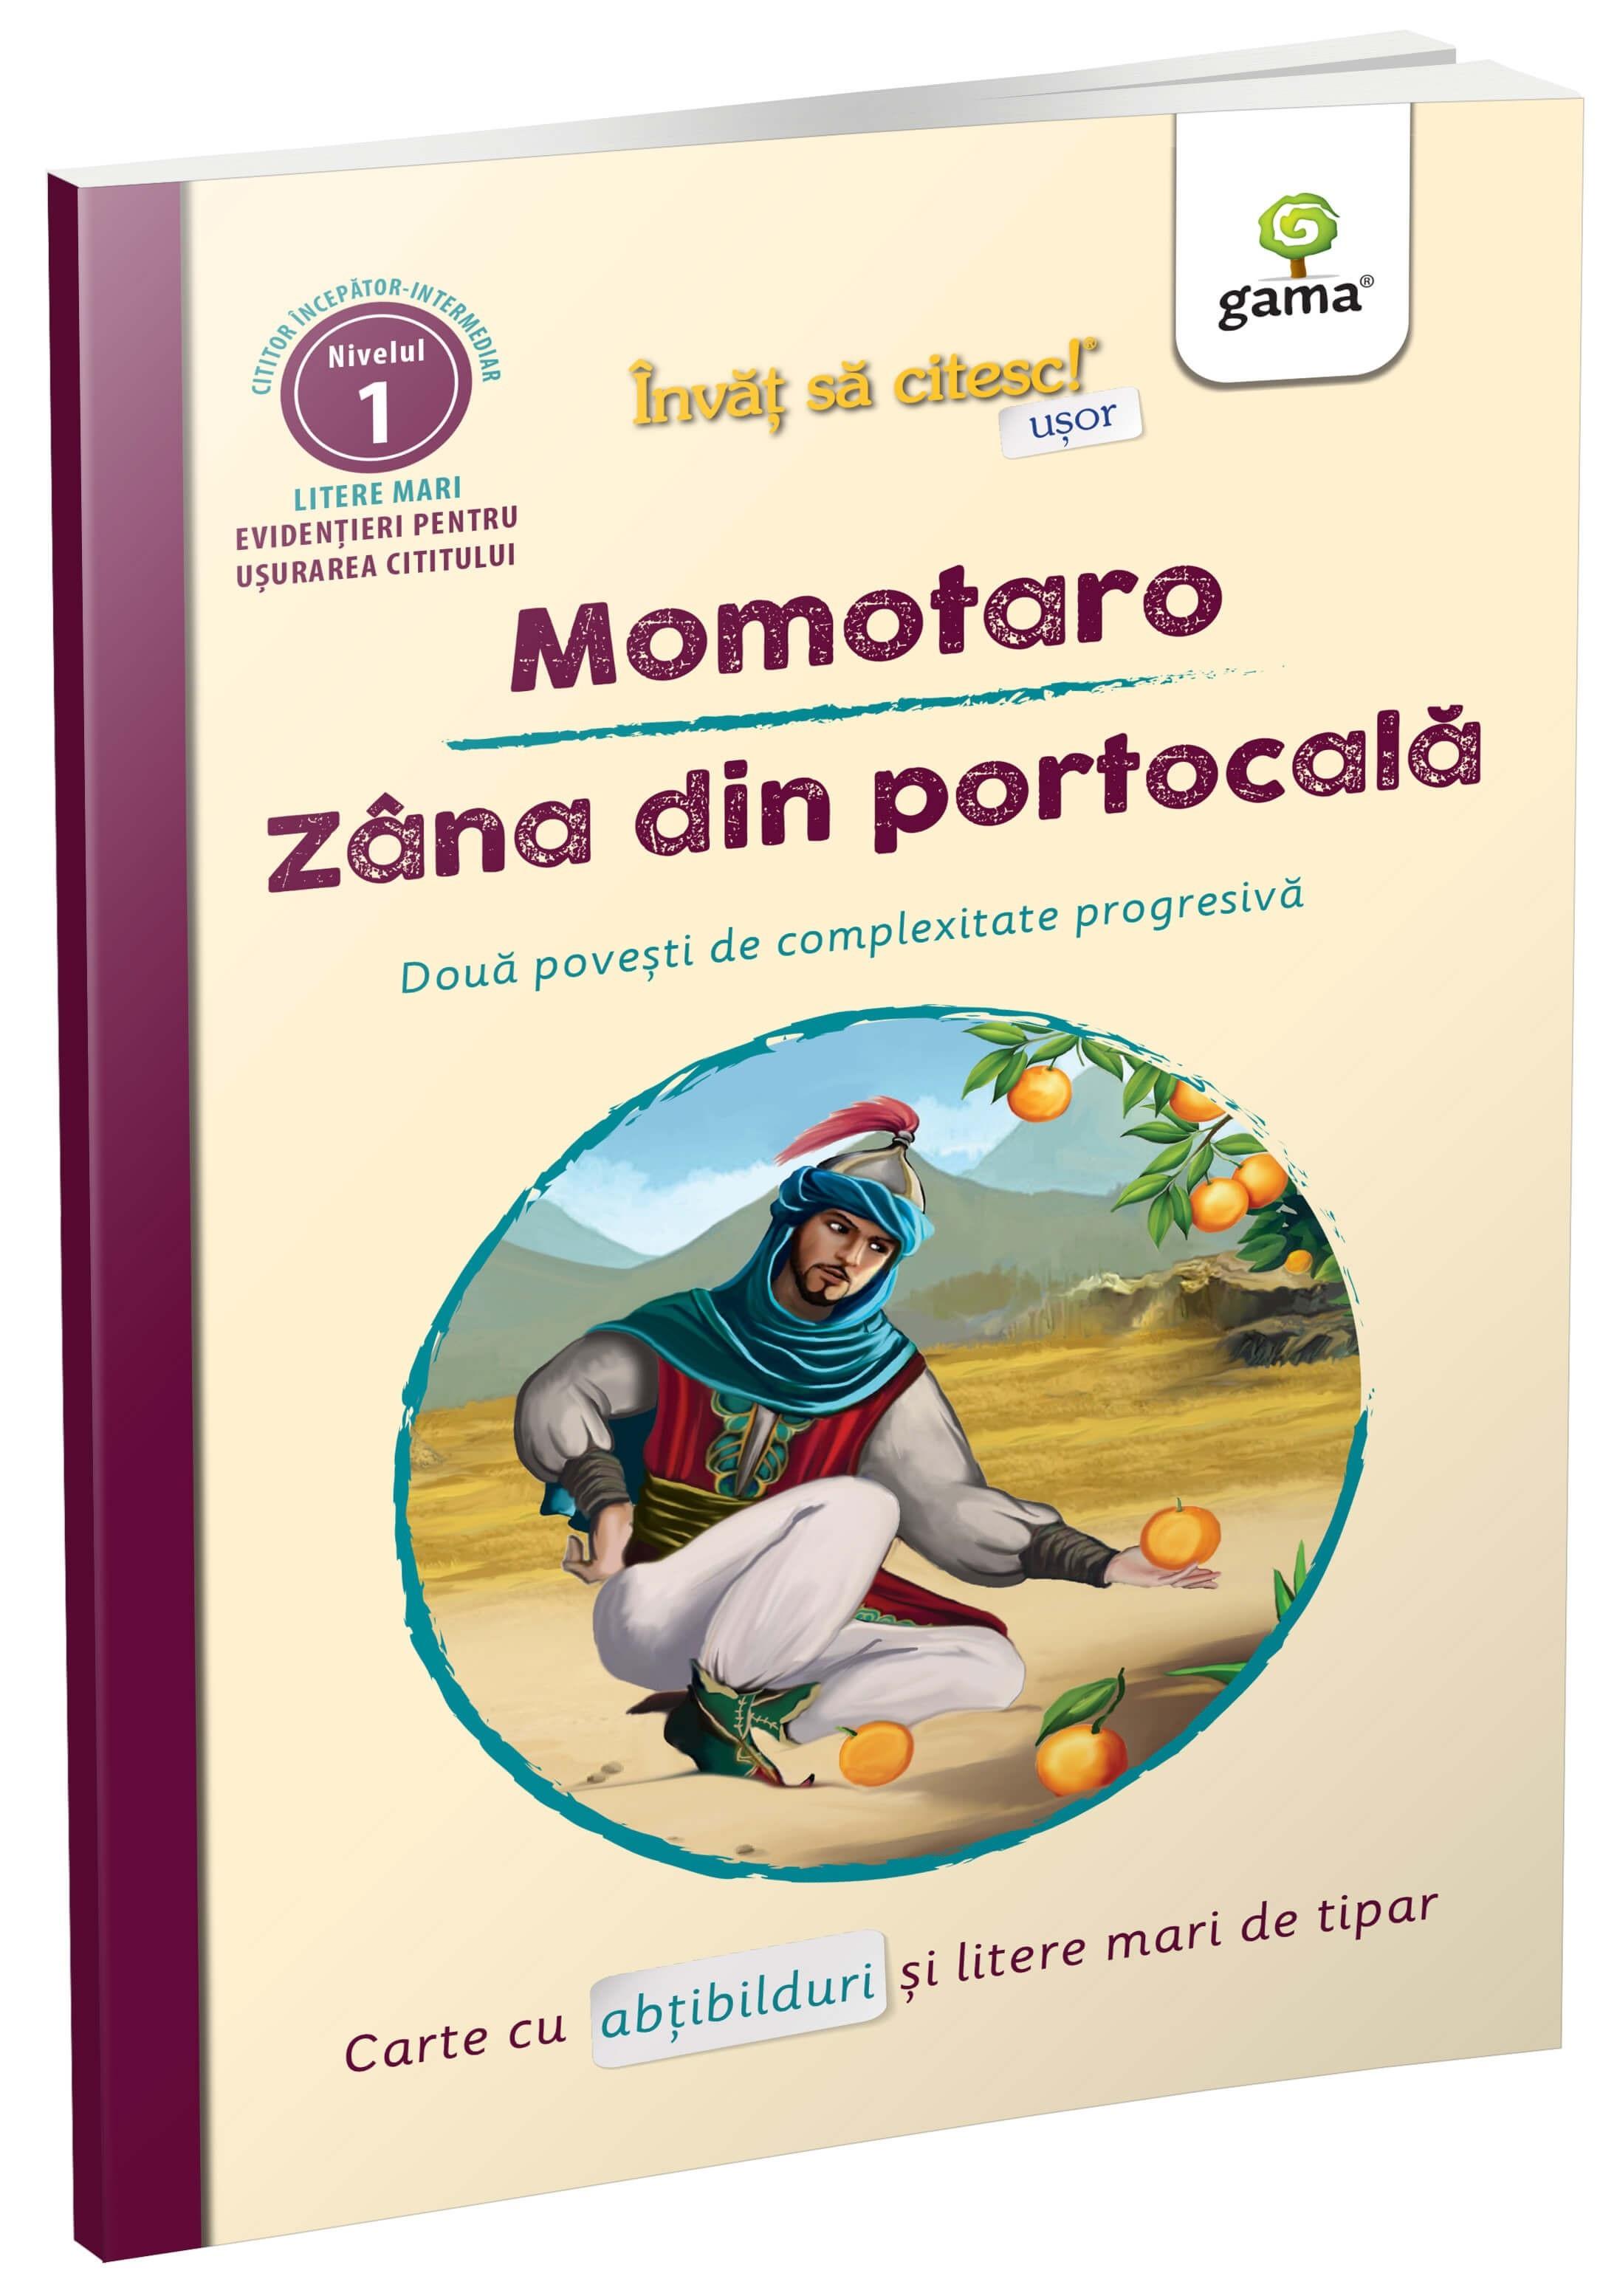 Momotaro - Zana din portocala